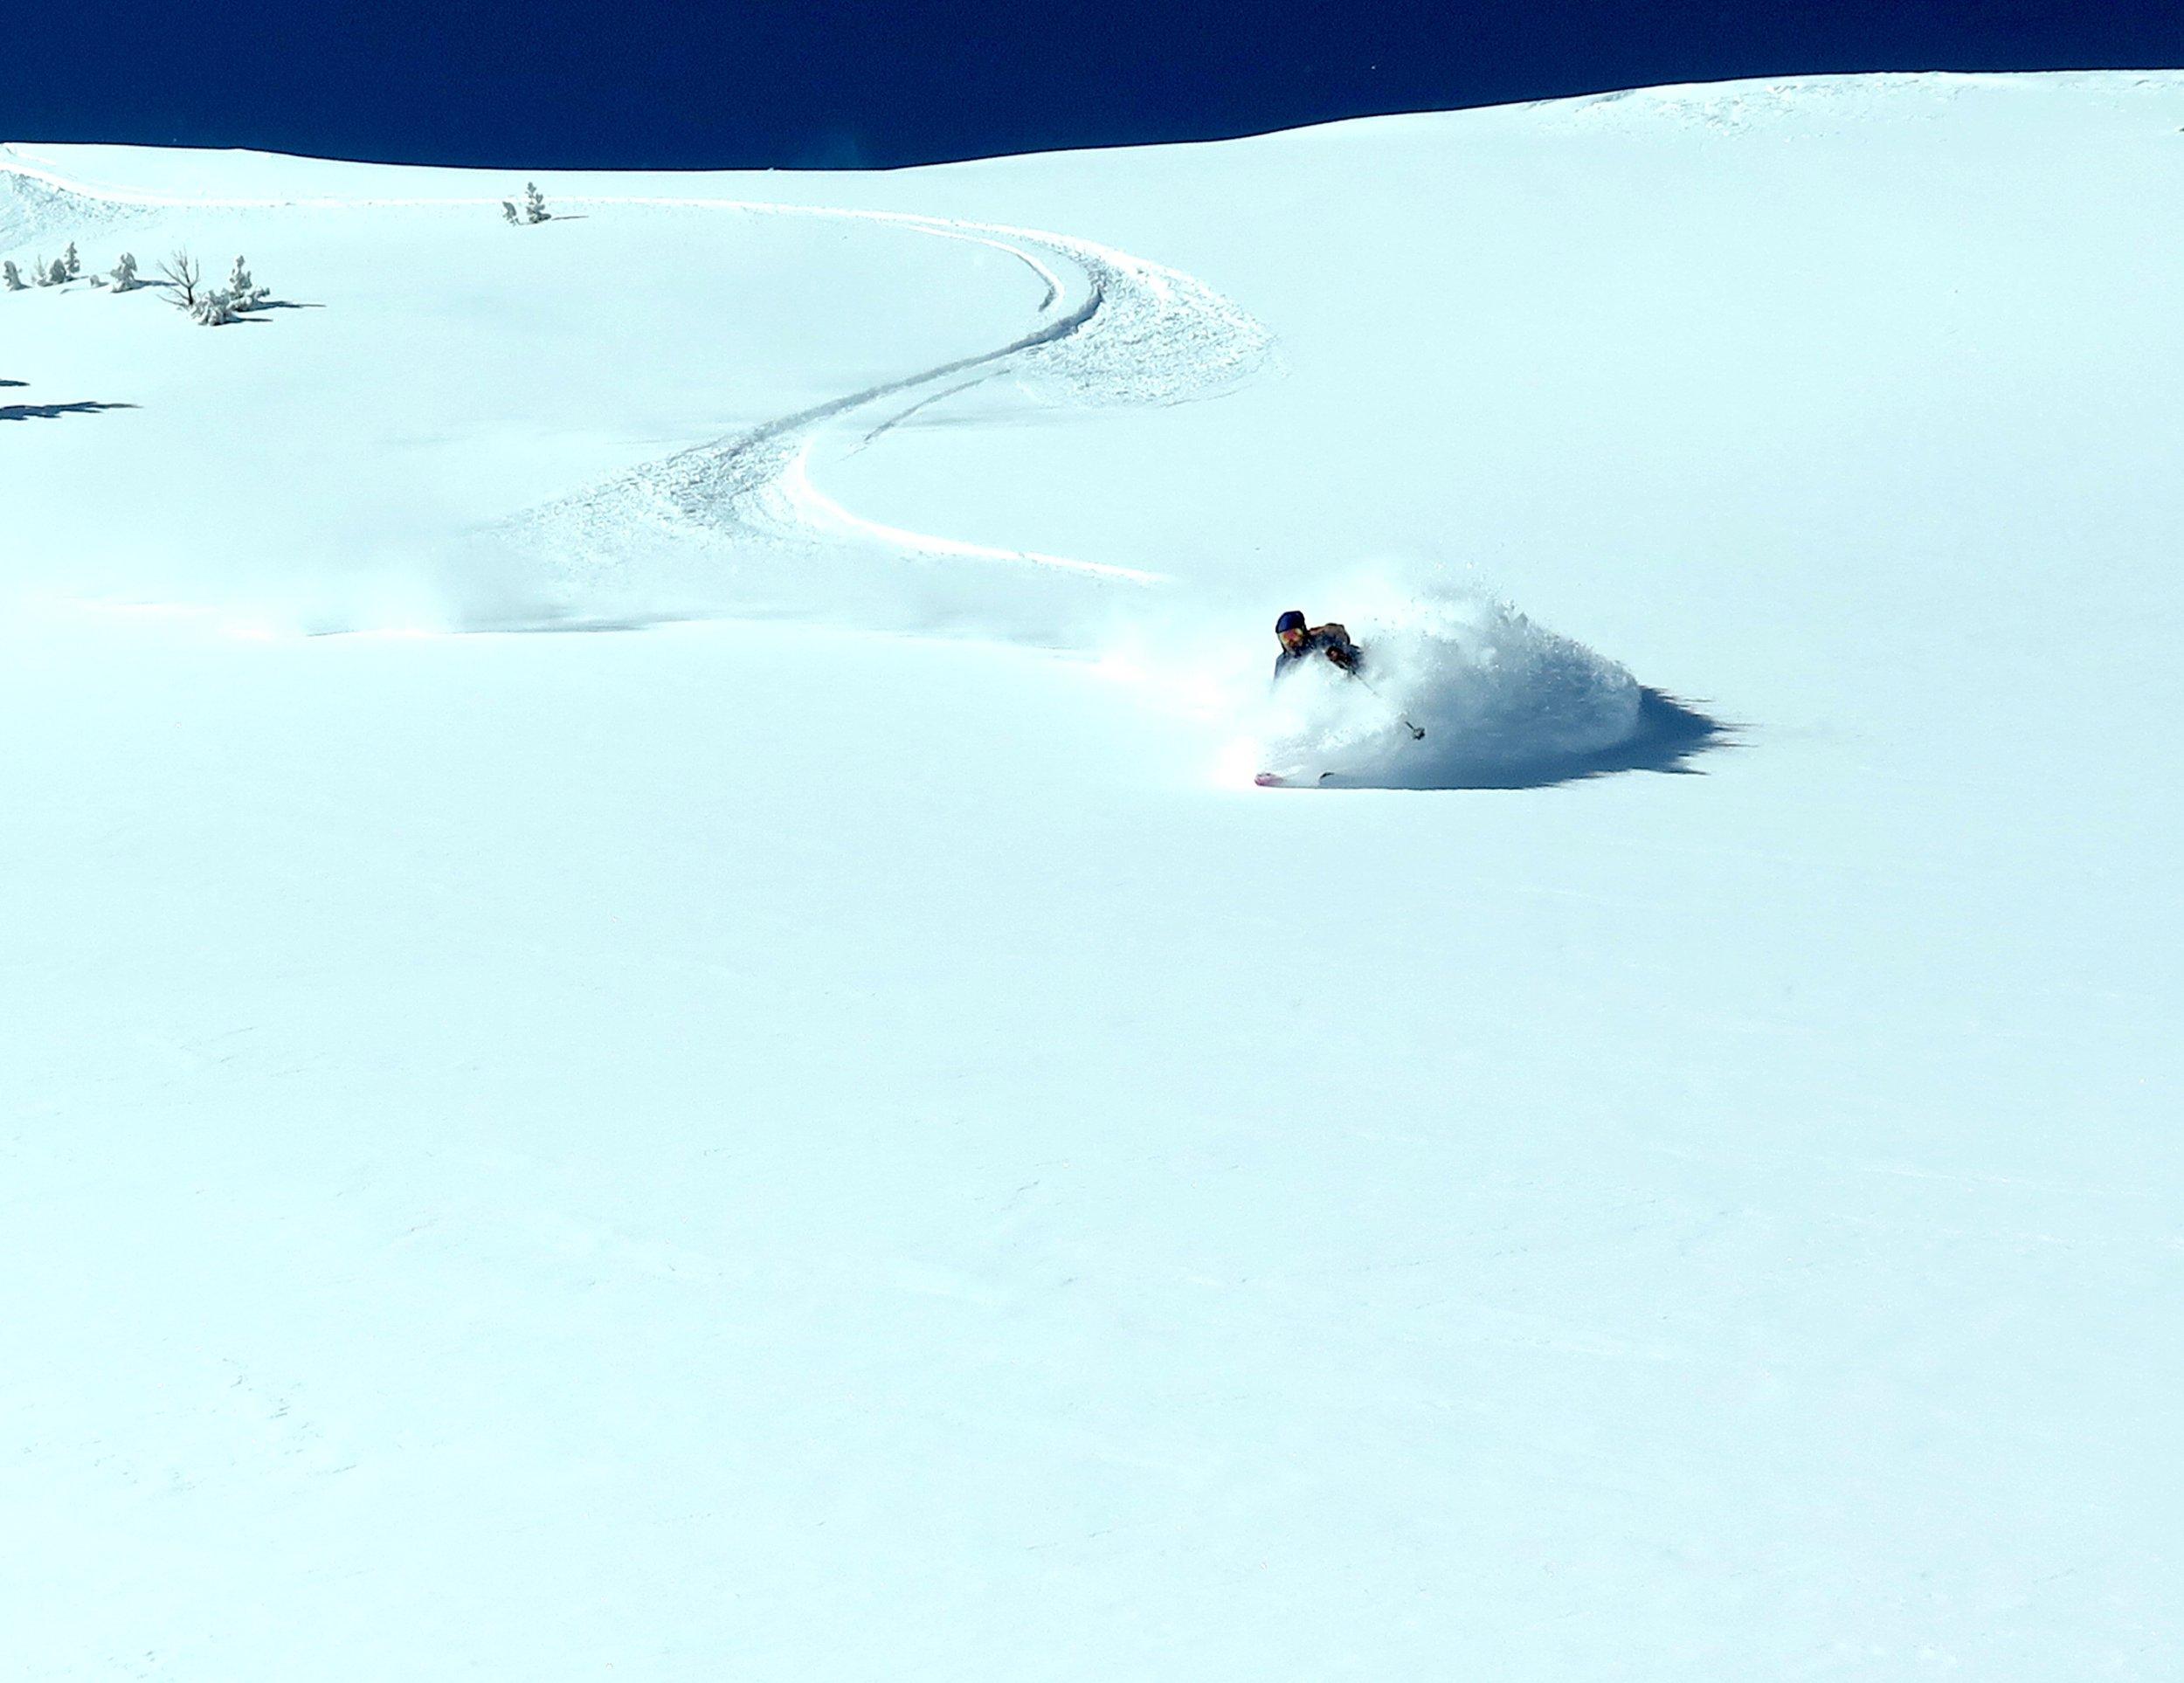 Big Sky backcountry powder skiing!